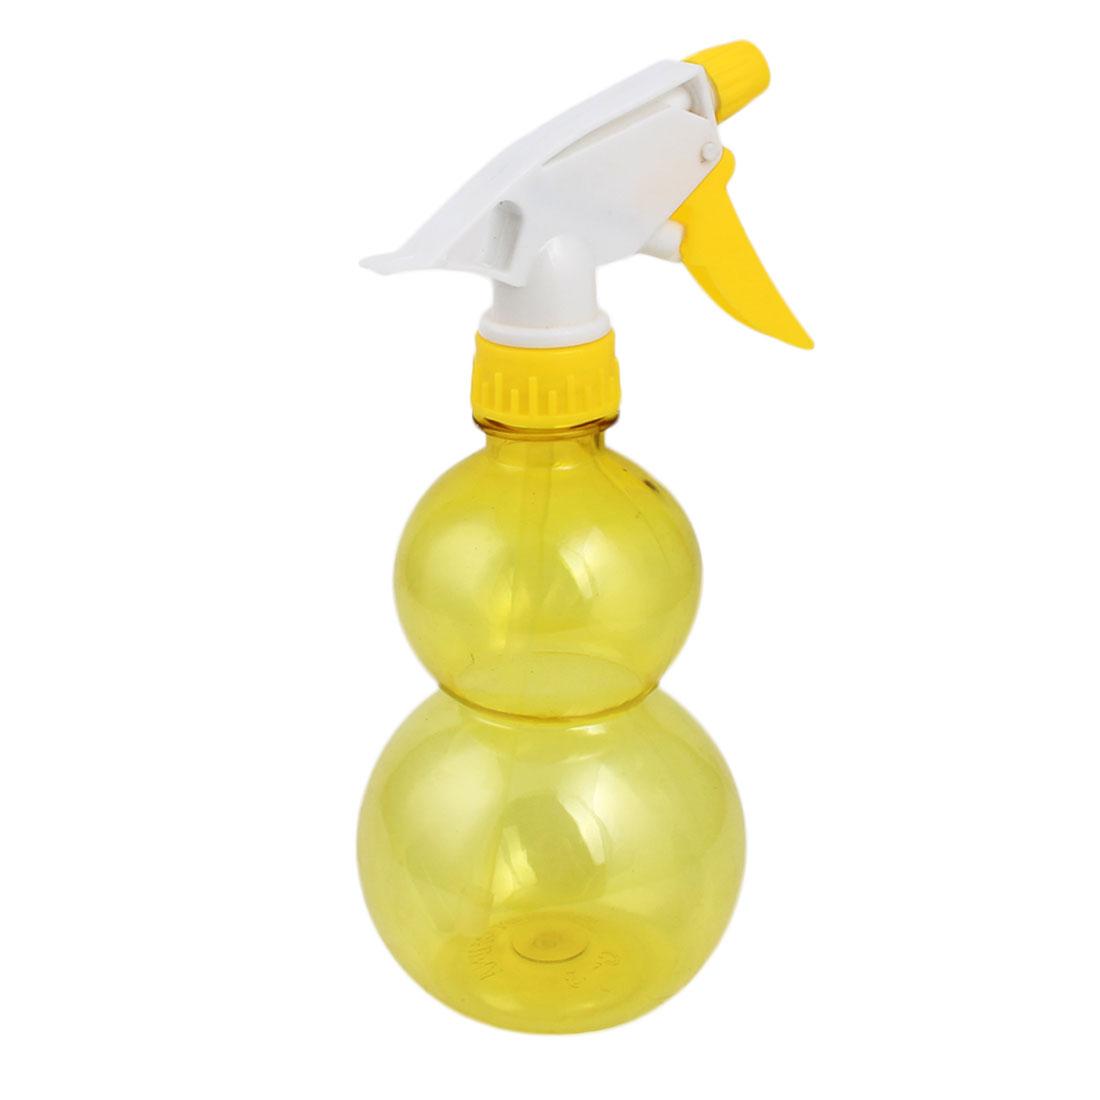 Home Garden Plastic Plants Flower Squeeze Water Trigger Sprayer Bottle 450ml Capacity